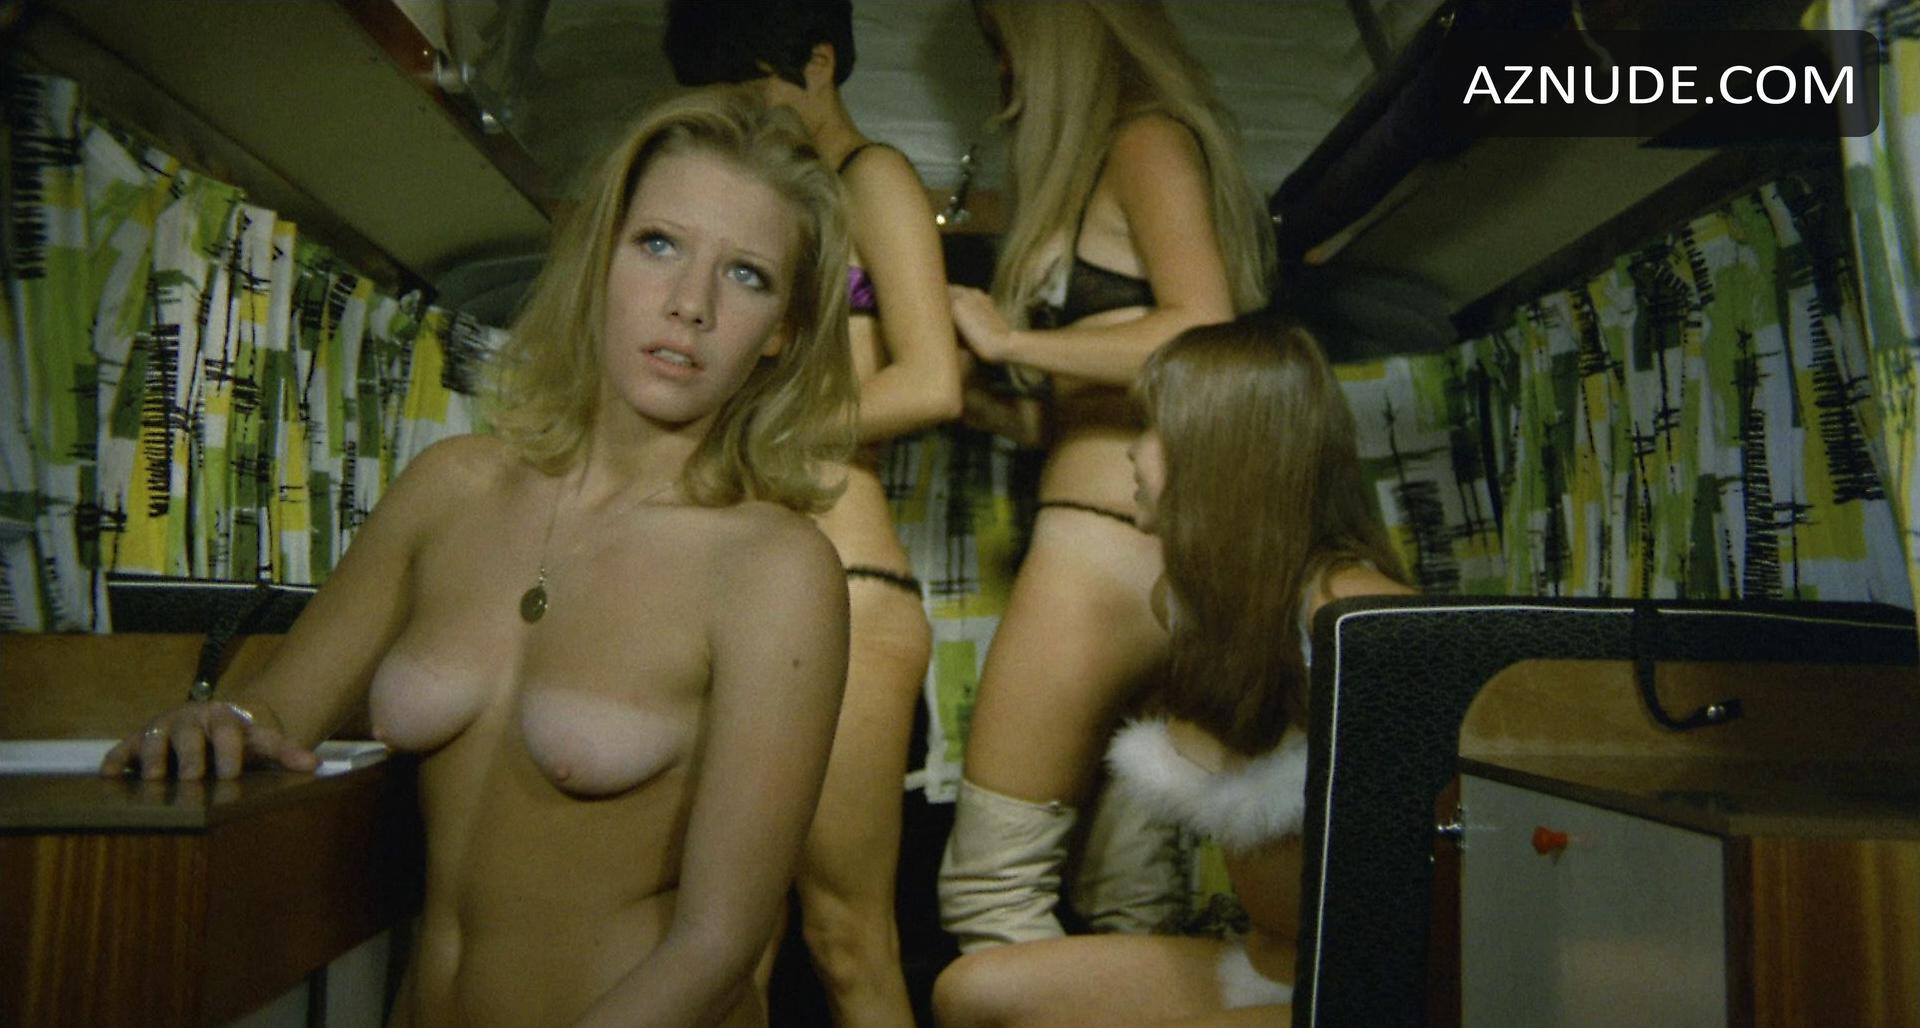 cathy howard nude aznude